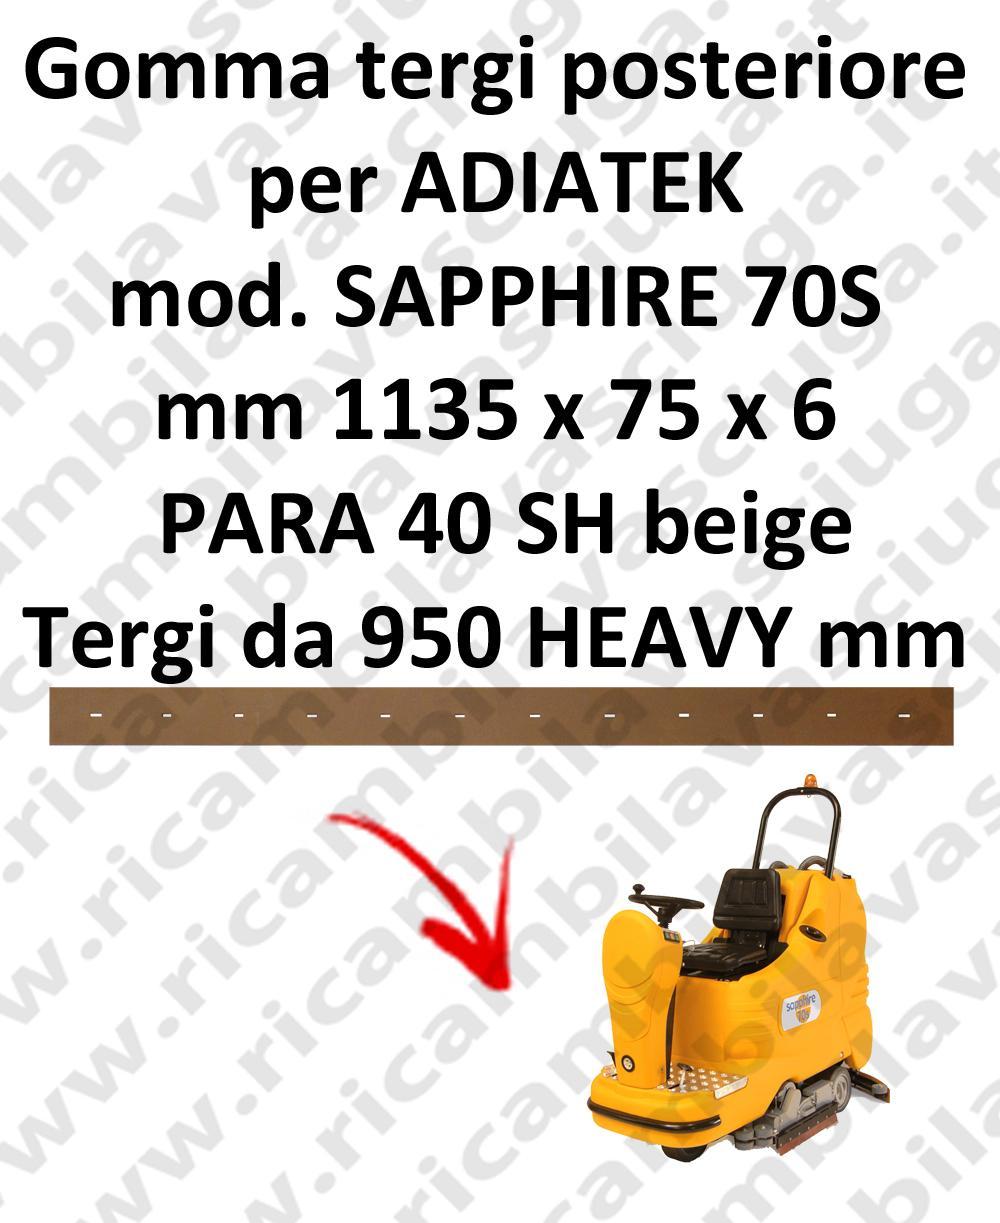 GOMMA TERGI posteriore per lavapavimenti SAPPHIRE 70S ADIATEK (tergi da 950 mm)